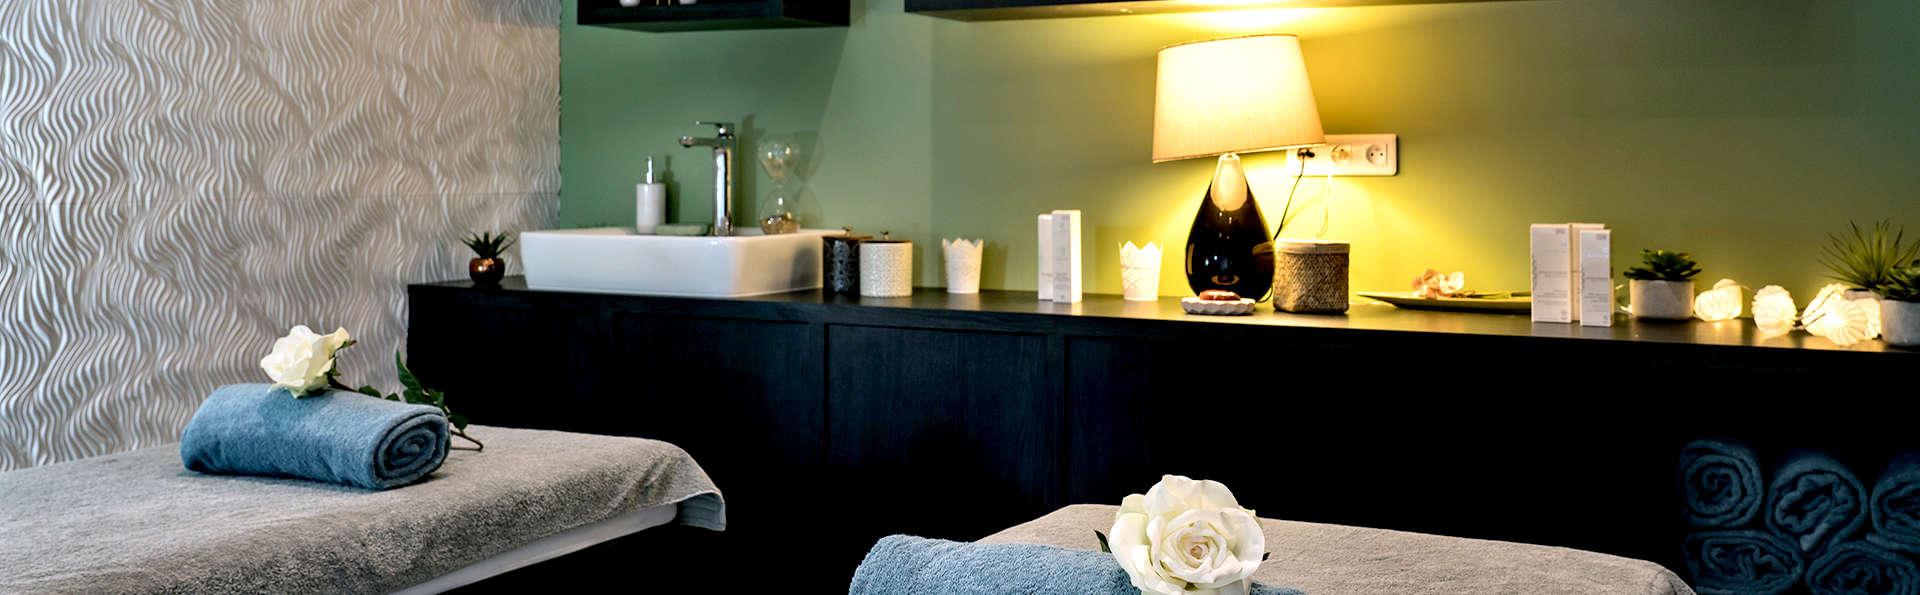 BEST WESTERN Hôtel de la Cité & Spa - EDIT_NEW_WELLNESS4.jpg